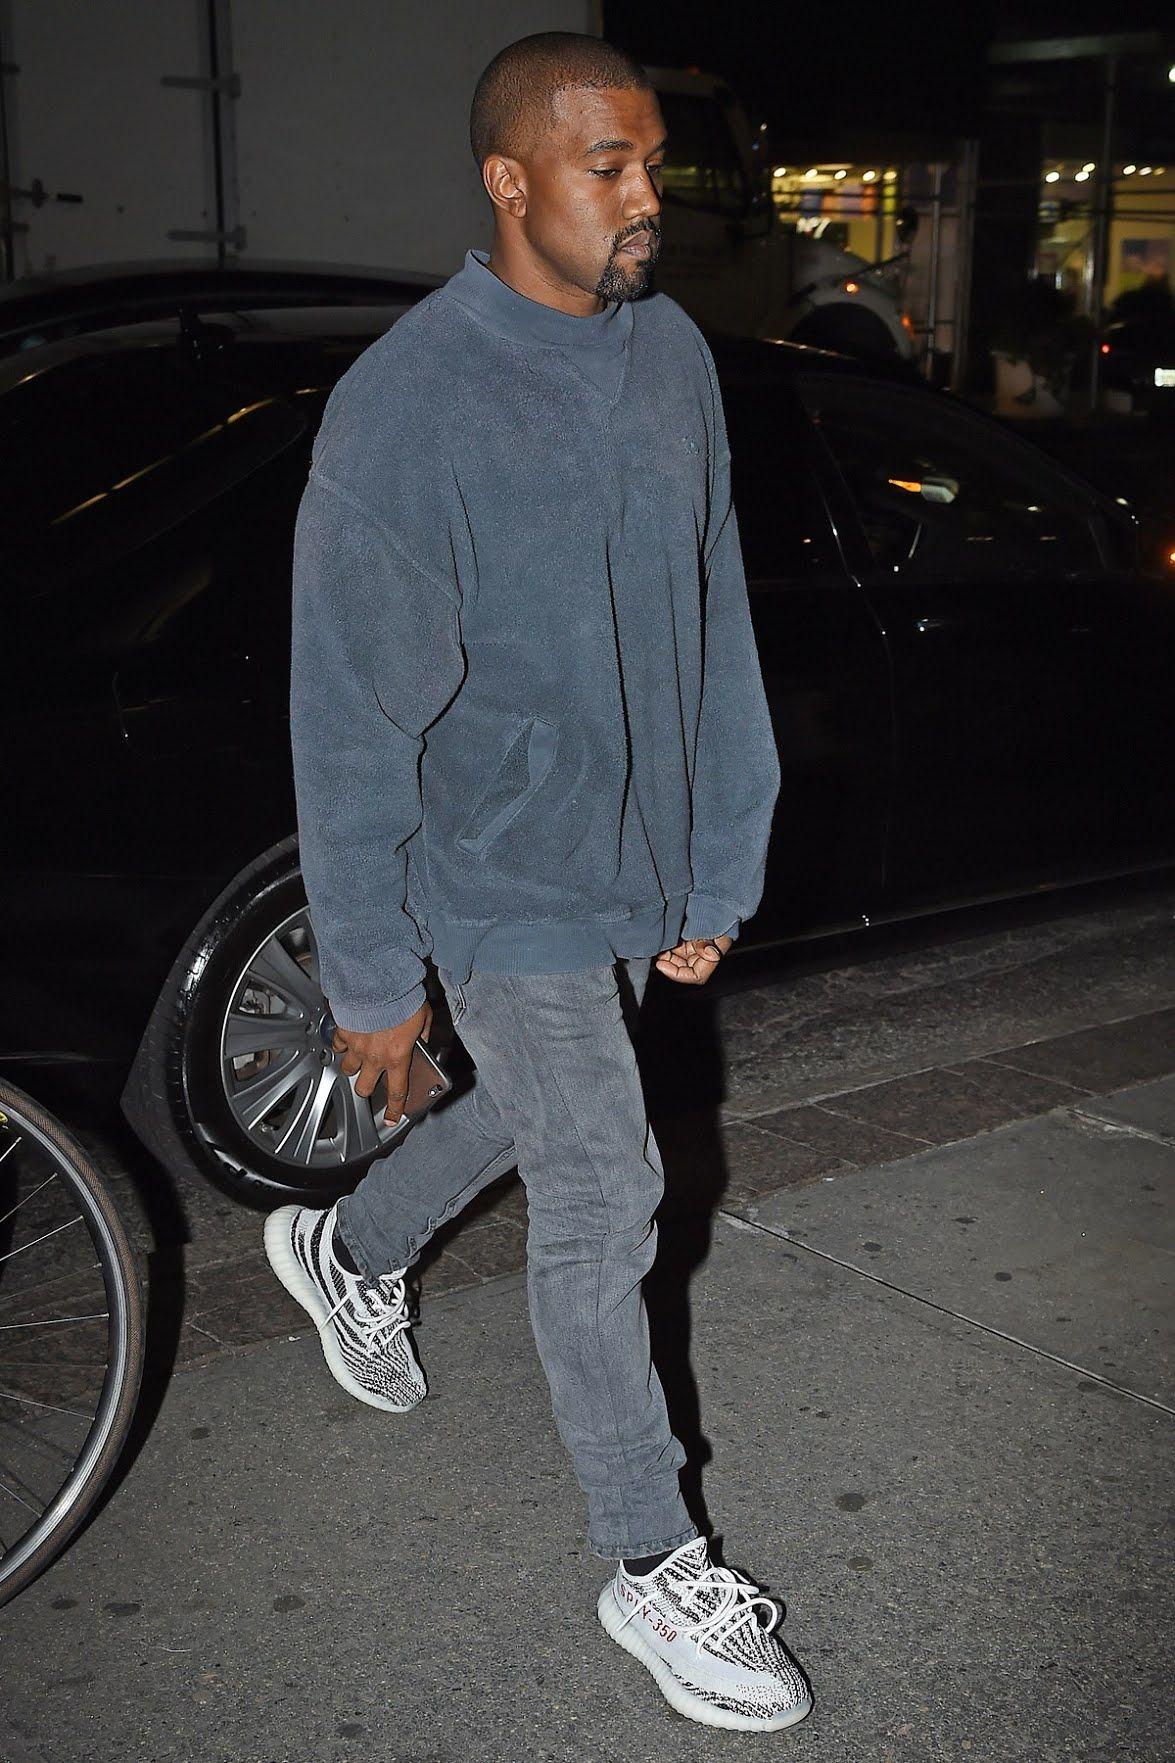 987cc7f10d1c3 Kanye West x Yeezy x Zebra V2